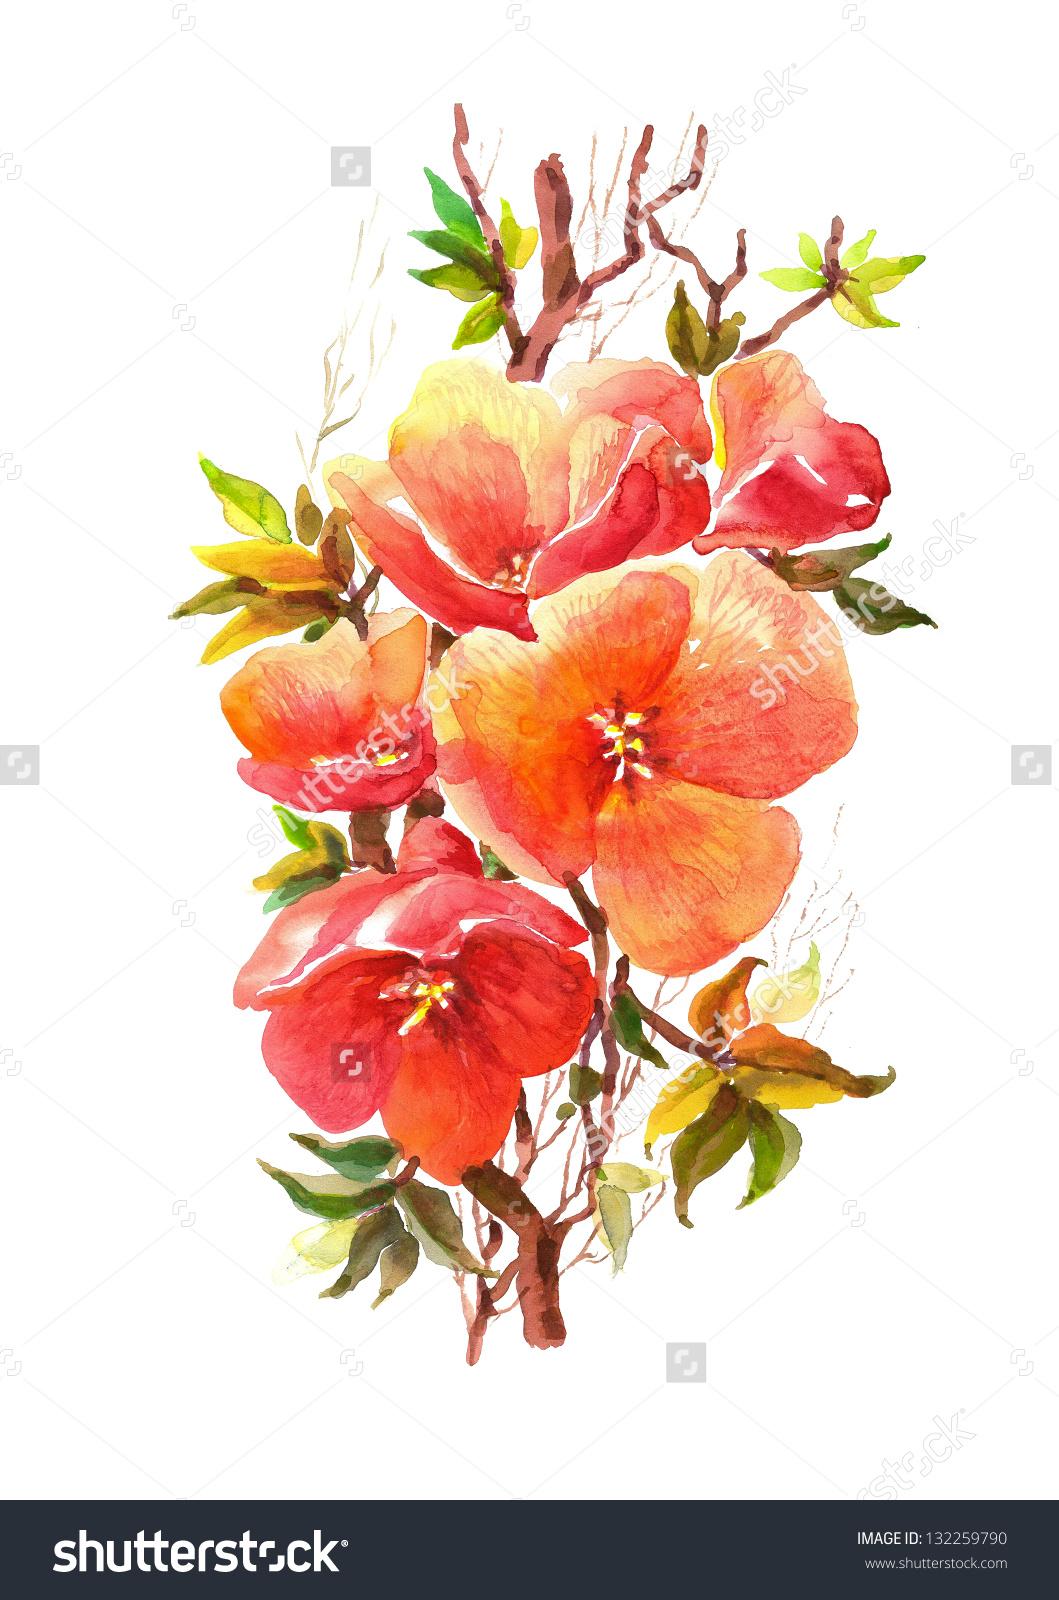 Pomegranate blossom clipart #3